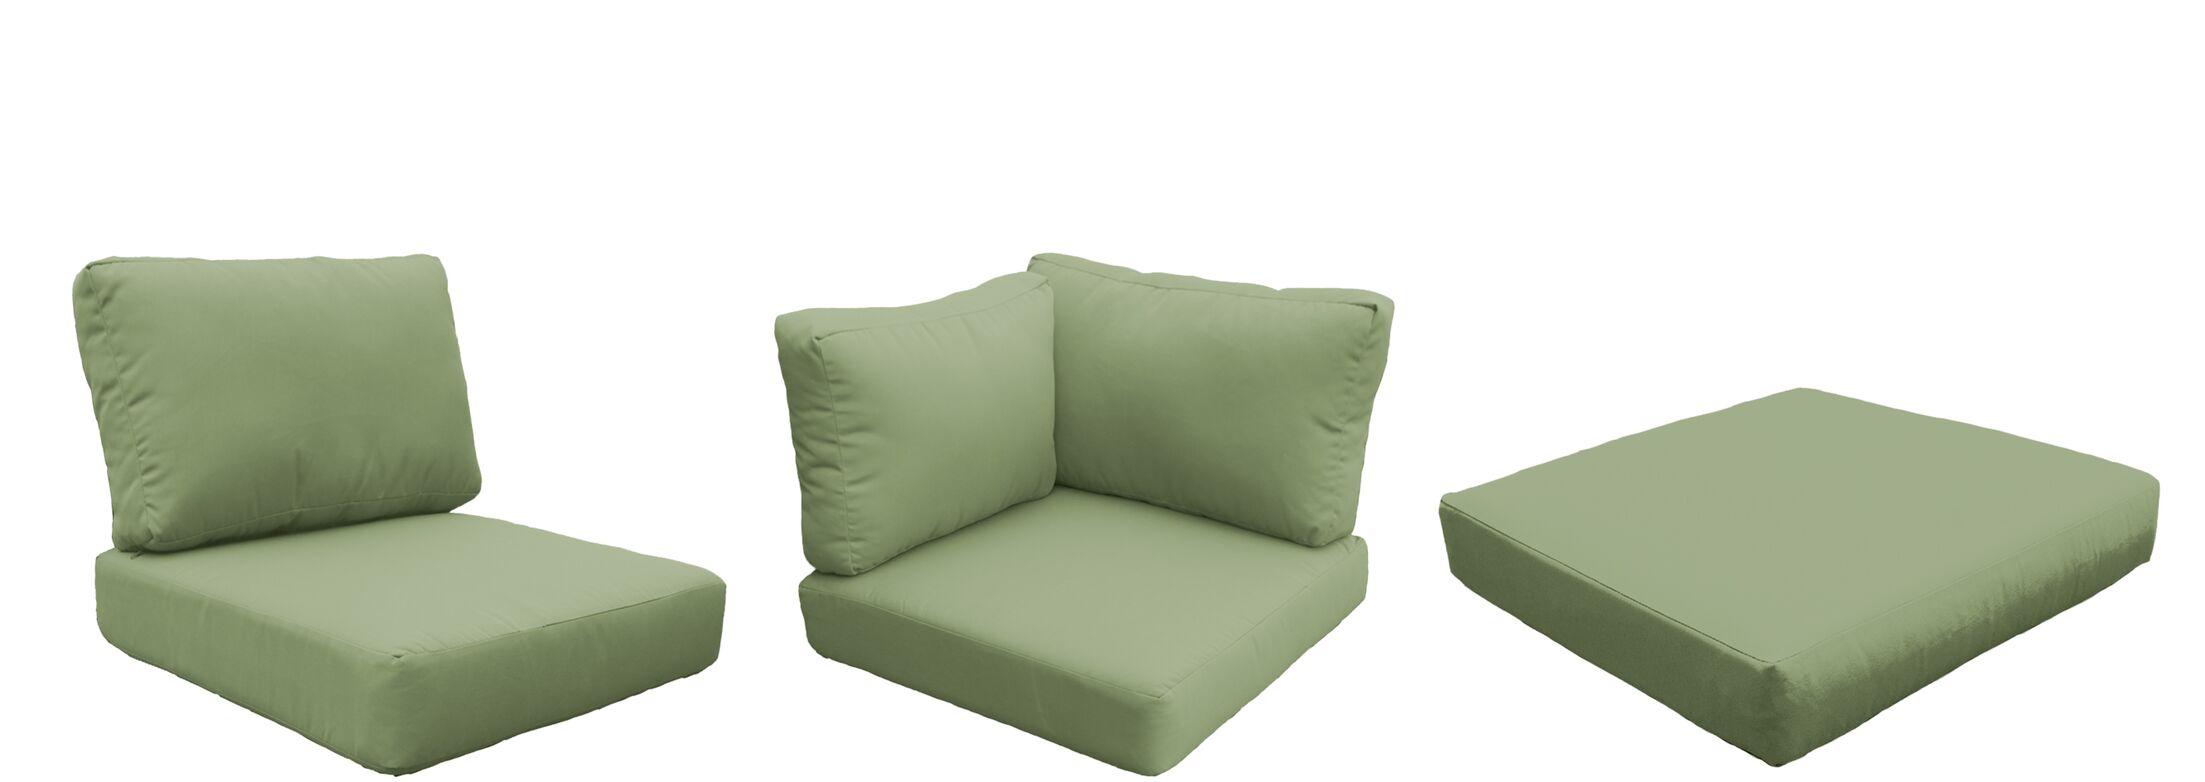 Eldredge Outdoor 18 Piece Lounge Chair Cushion Set Fabric: Cilantro